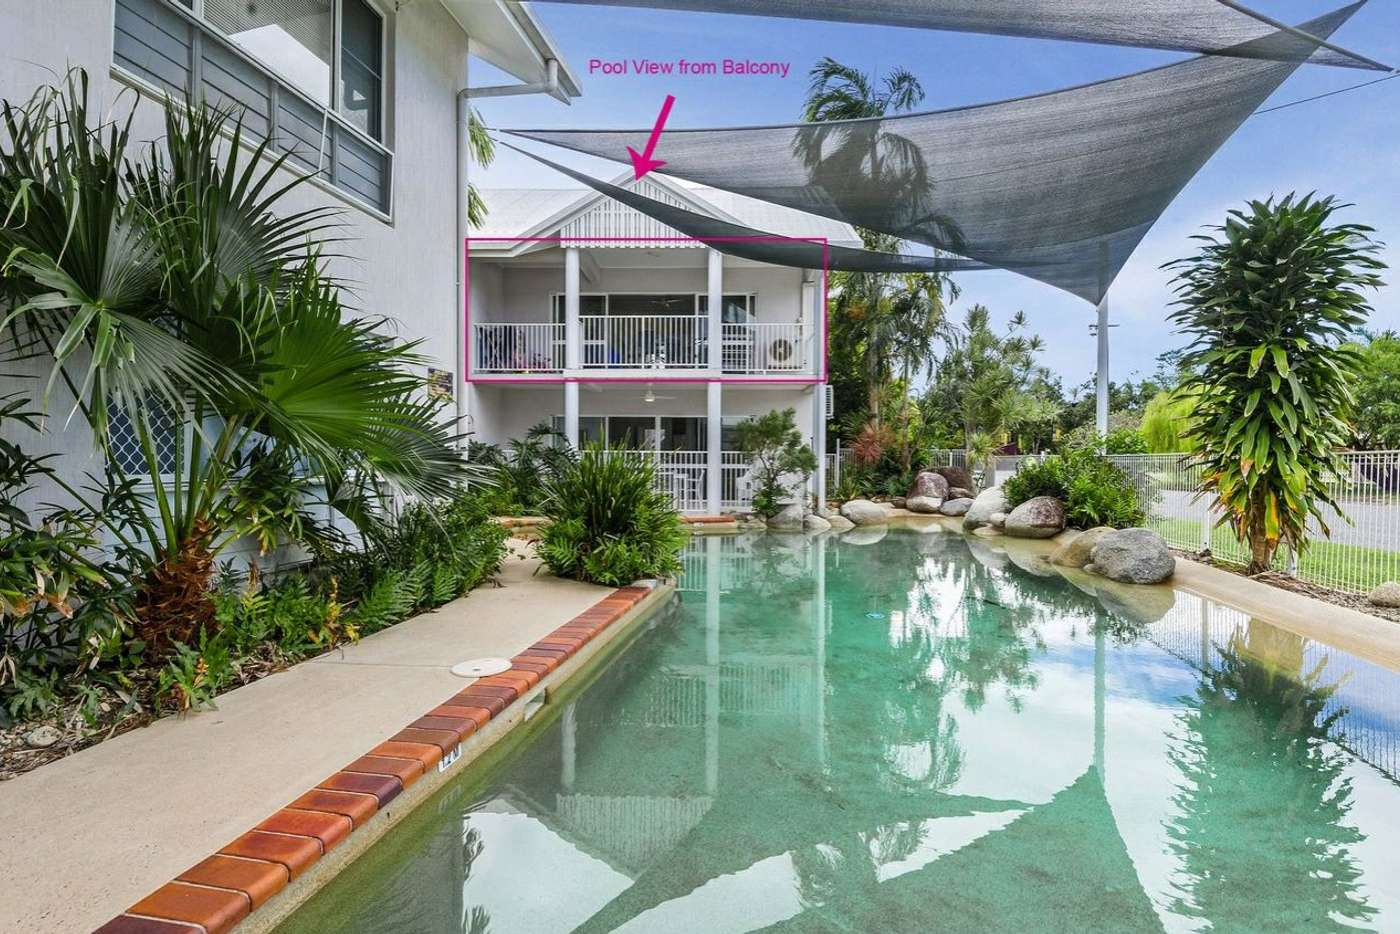 Main view of Homely apartment listing, 4 Sailz/1 - 3 Pecten Ave, Port Douglas QLD 4877